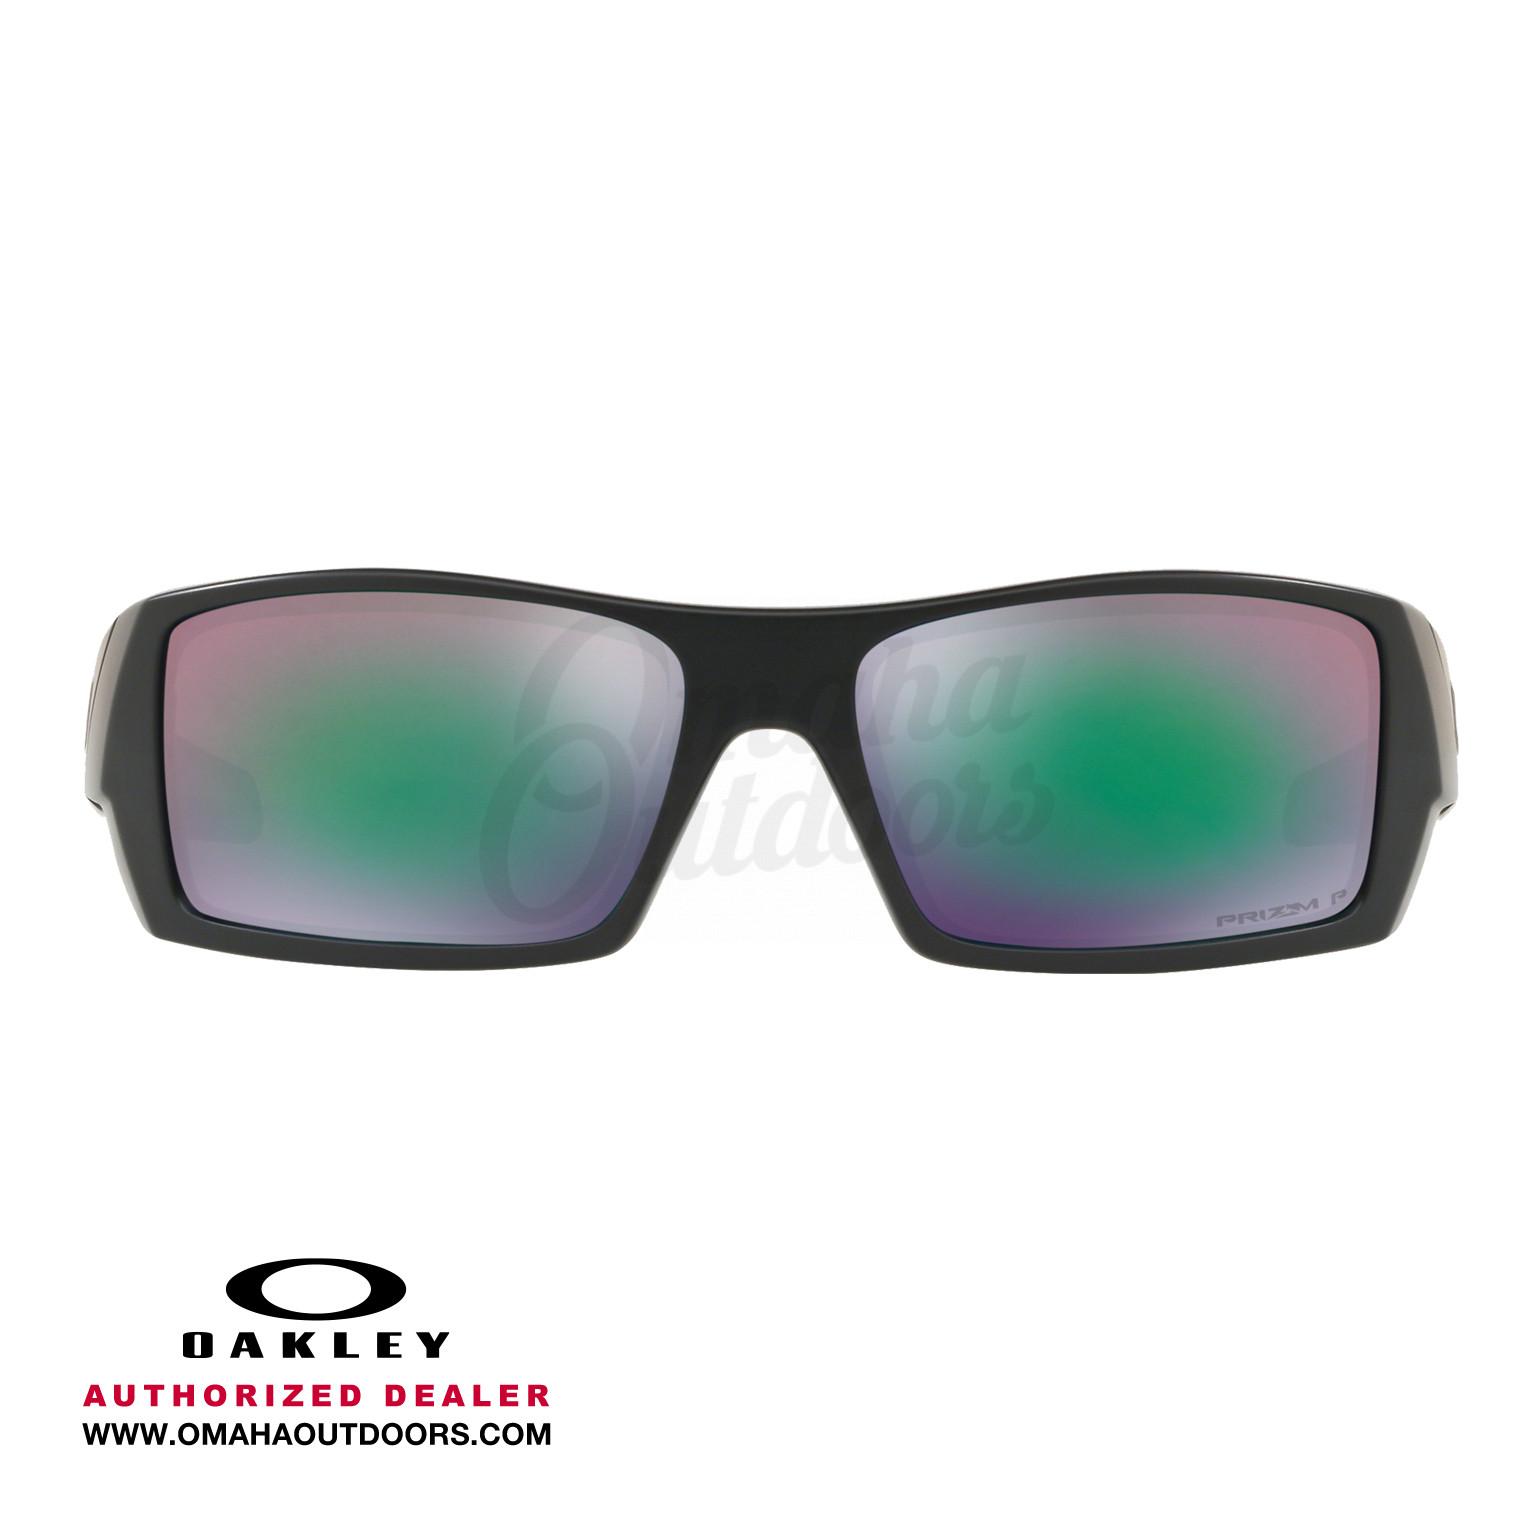 6f2f0ada15 Oakley SI Gascan Maritime Sunglasses Prizm Maritime Polarized Lens ·  OO9014-4760 · 888392345509